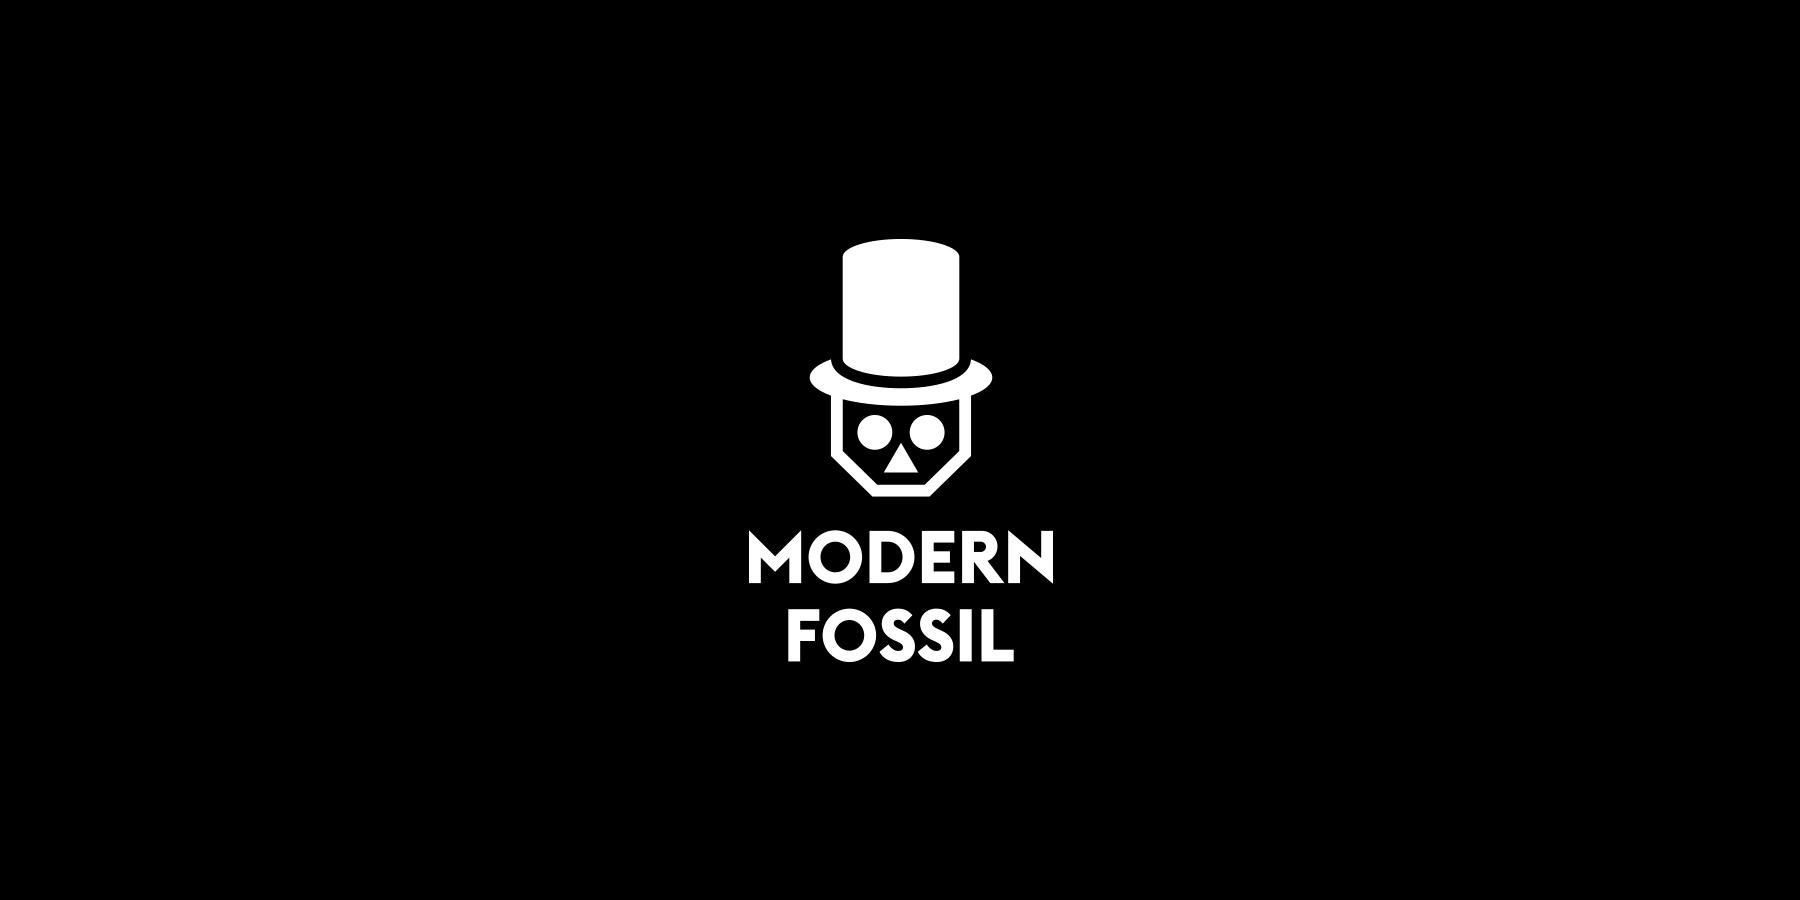 modern-fossil-logo-design-03